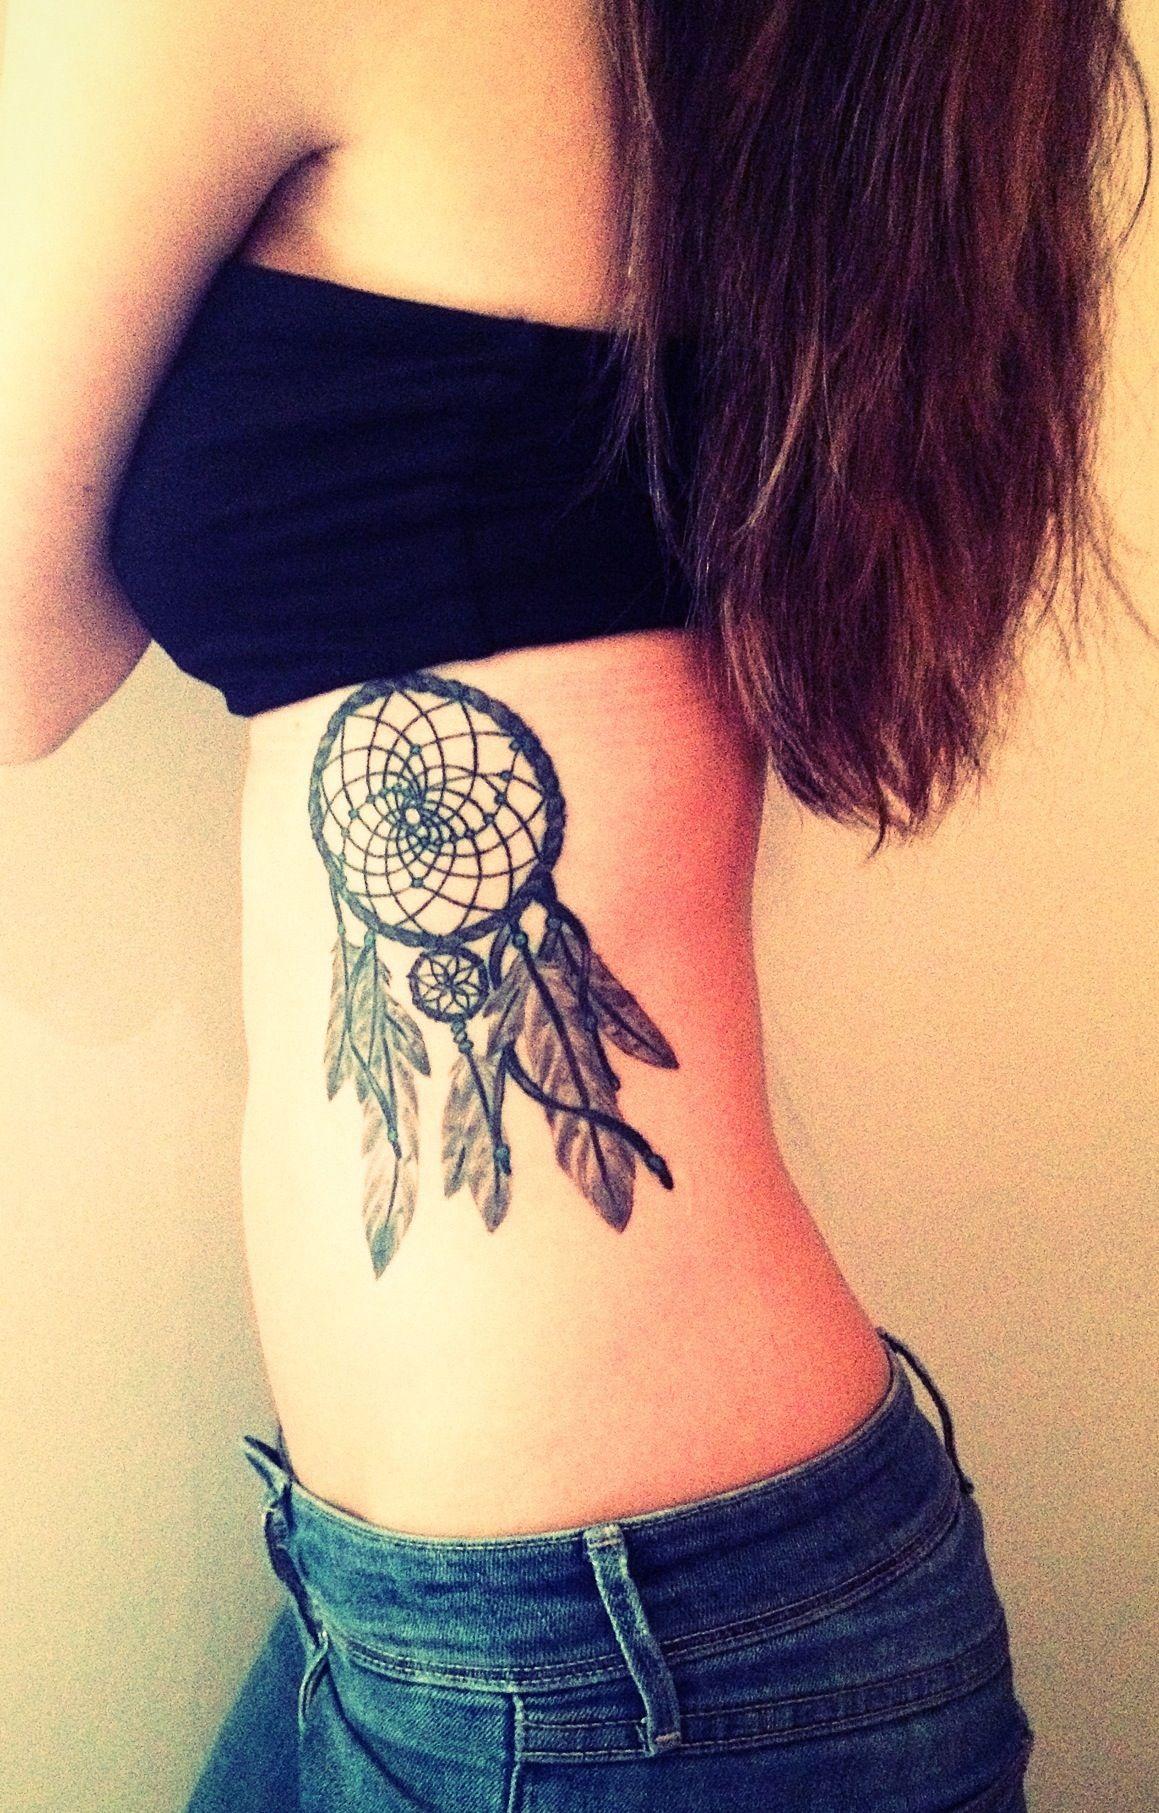 Dream Catcher Tattoo On Rib Cage 40 Rib Tattoos for Girls Design Ideas Tattoo Dreamcatcher 6